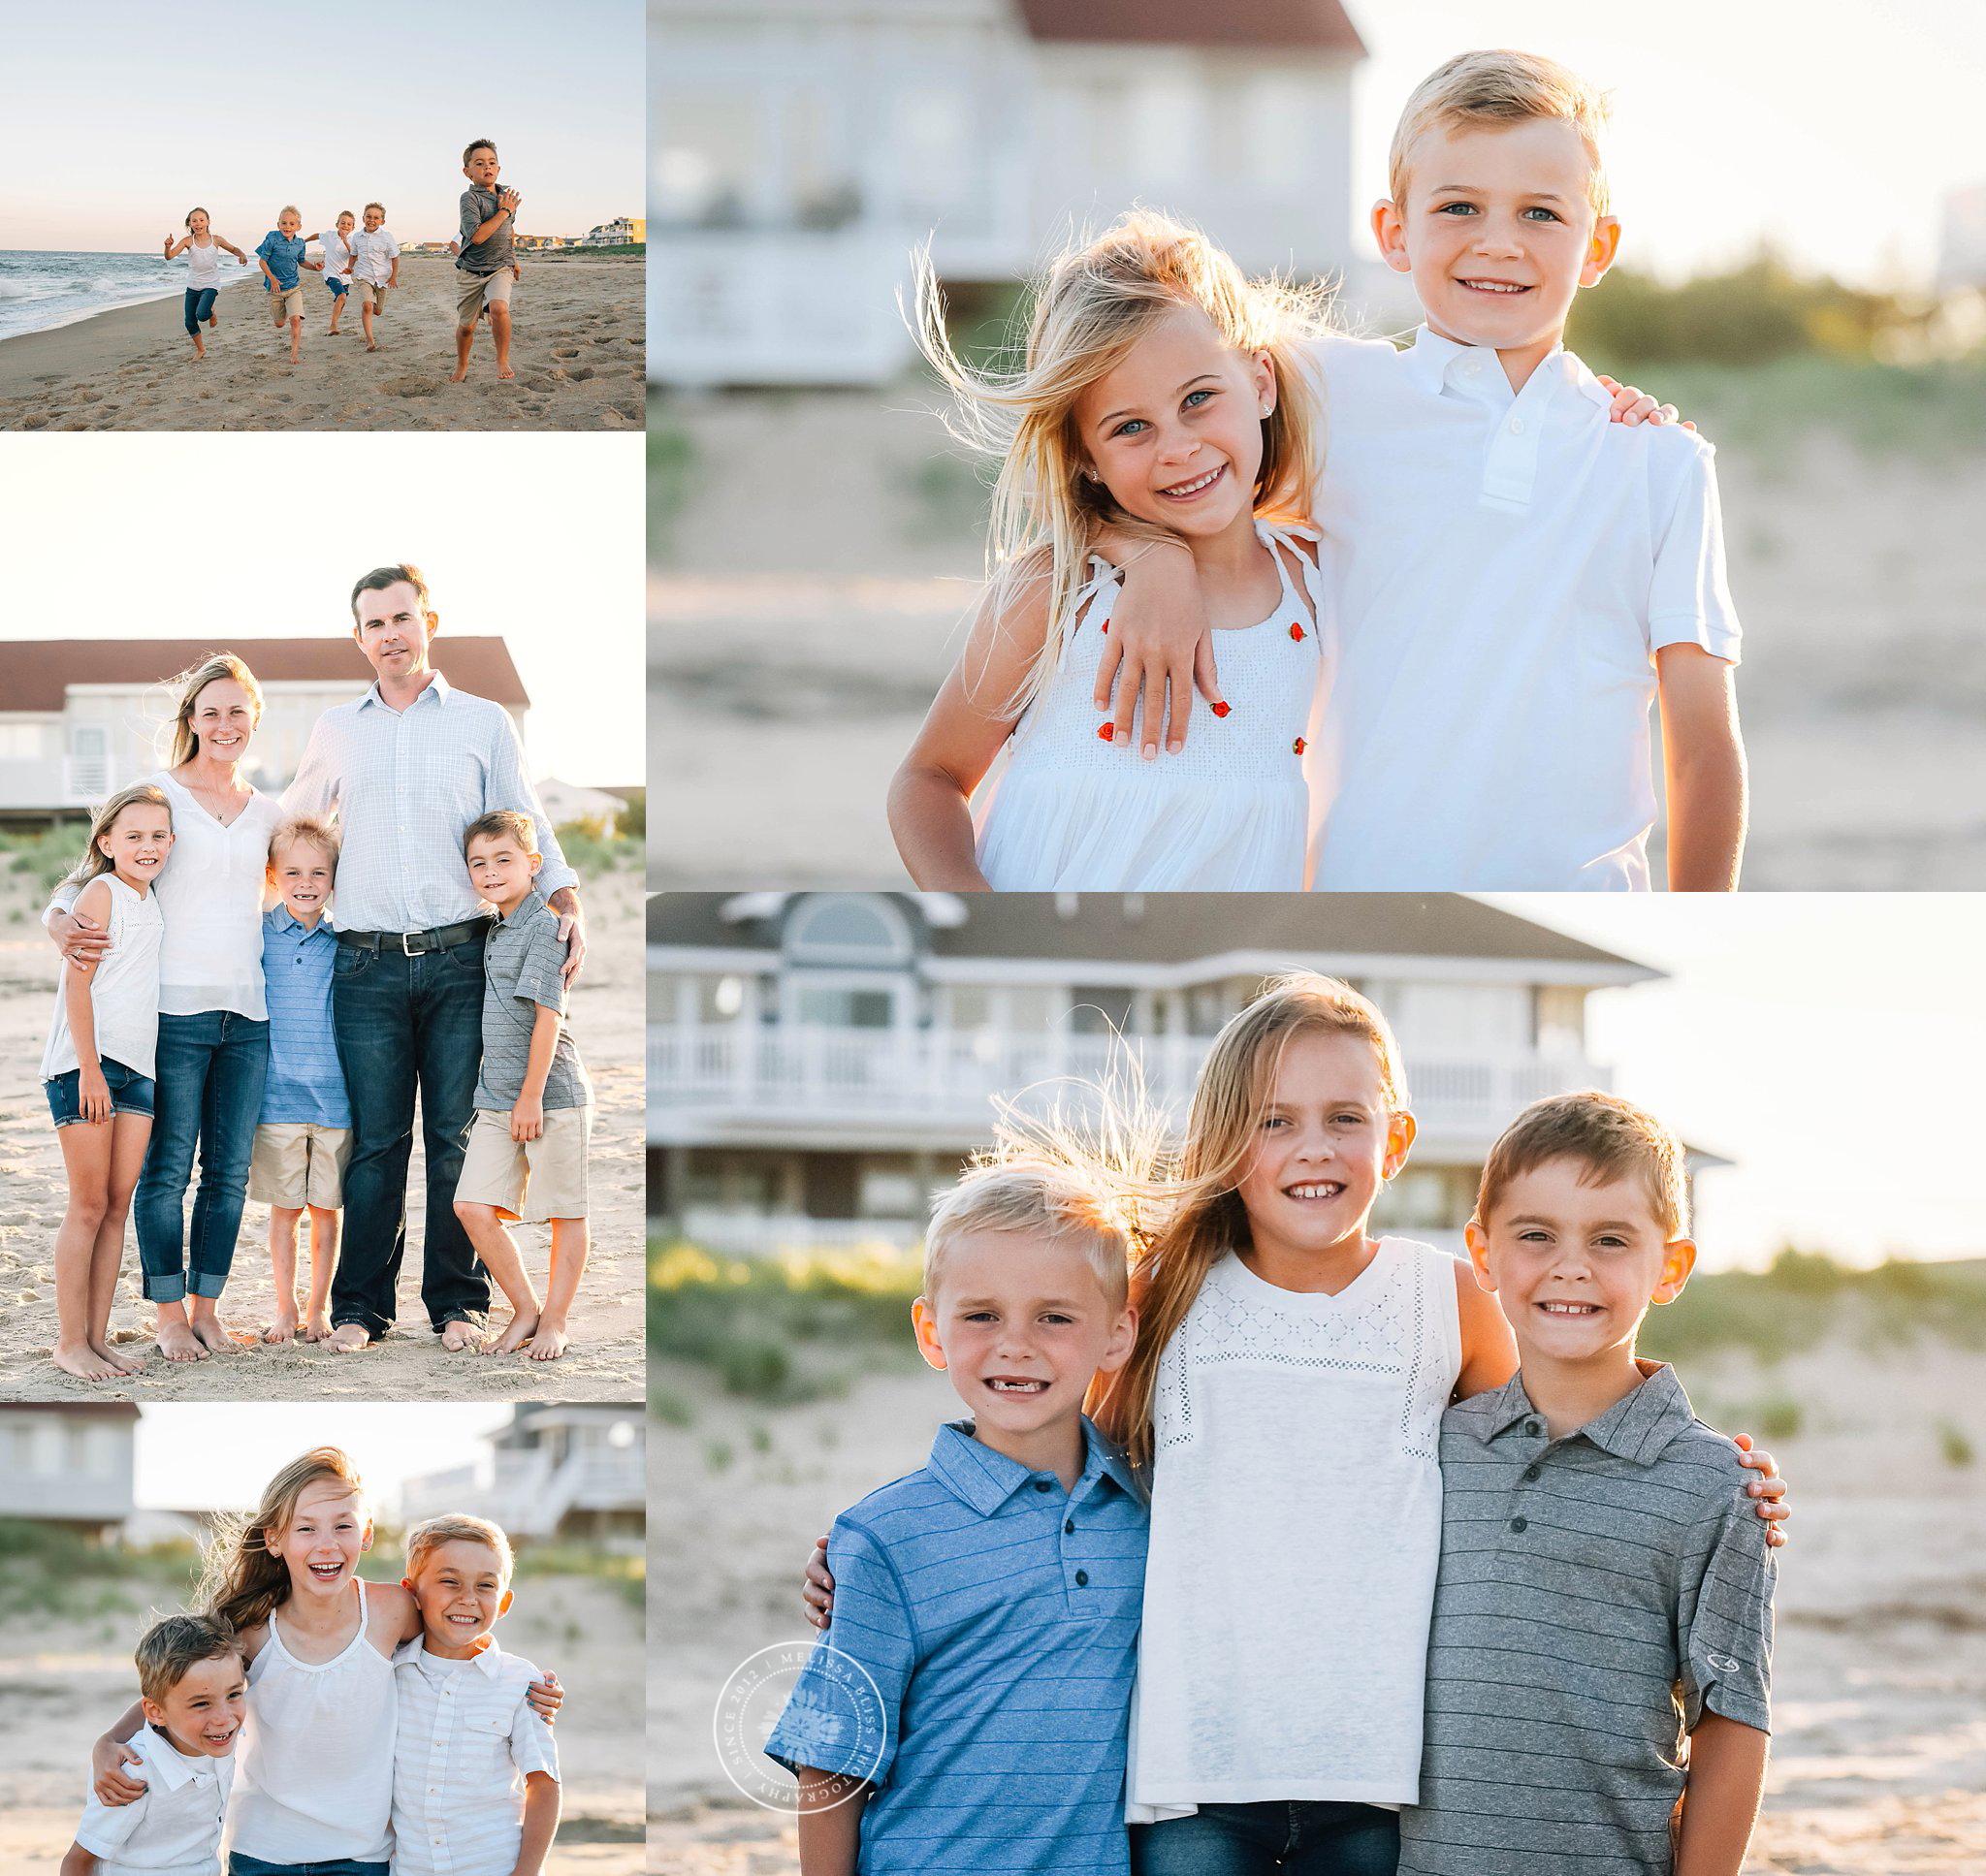 norfolk-virginia-beach-sandbridge-chesapeake-photographers-melissa-bliss-photography-family-lifestyle-photos.jpg